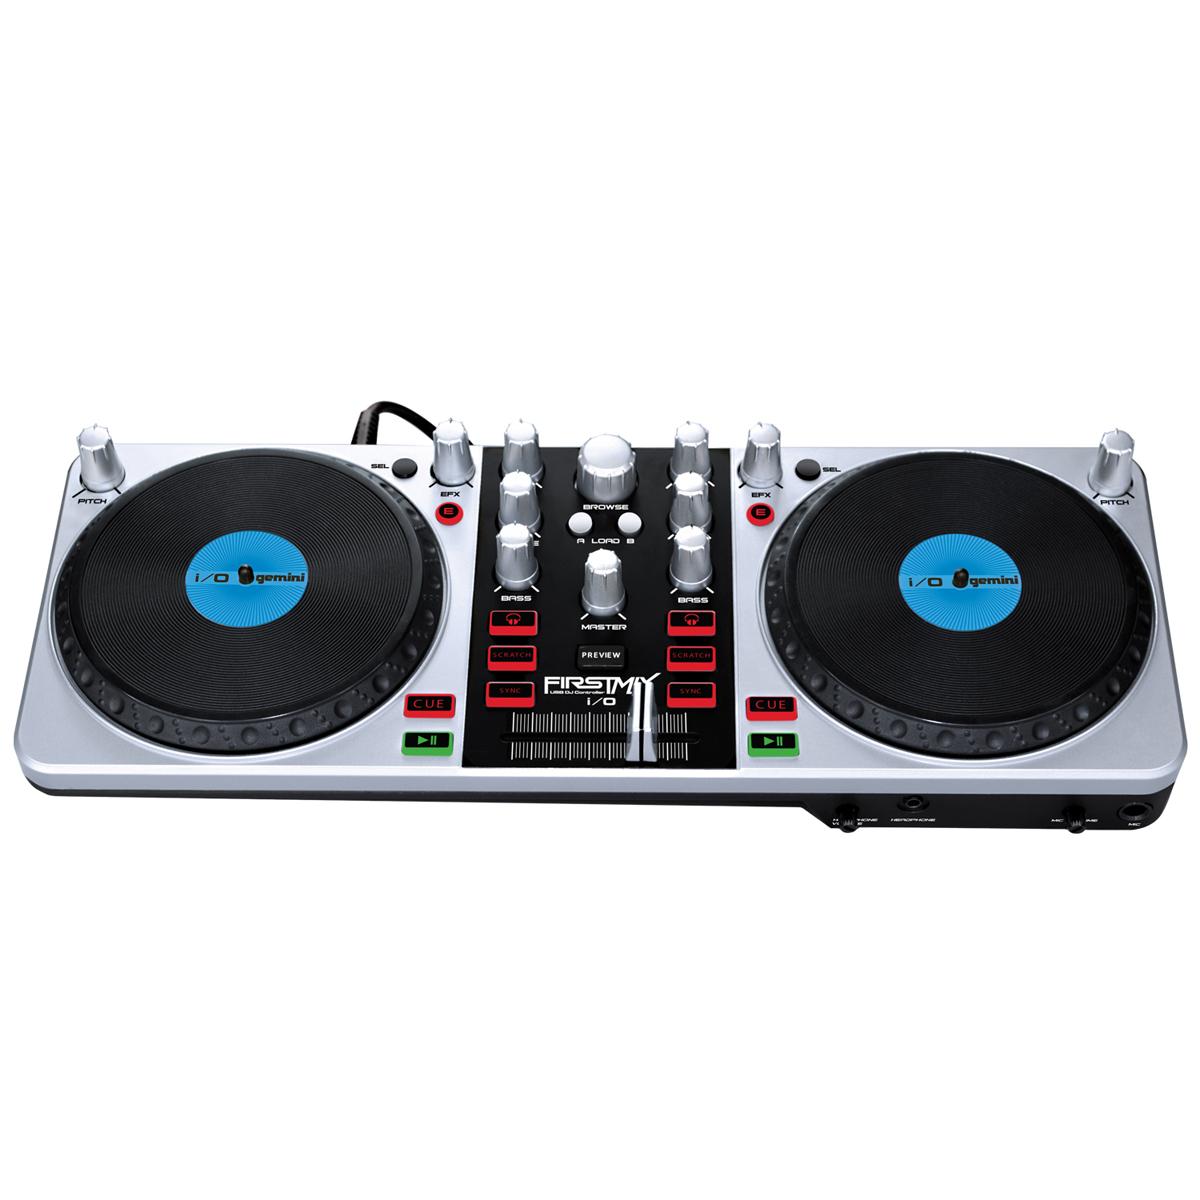 Gemini firstmix i o firstmix i o achat vente table - Table de mixage avec carte son integree ...